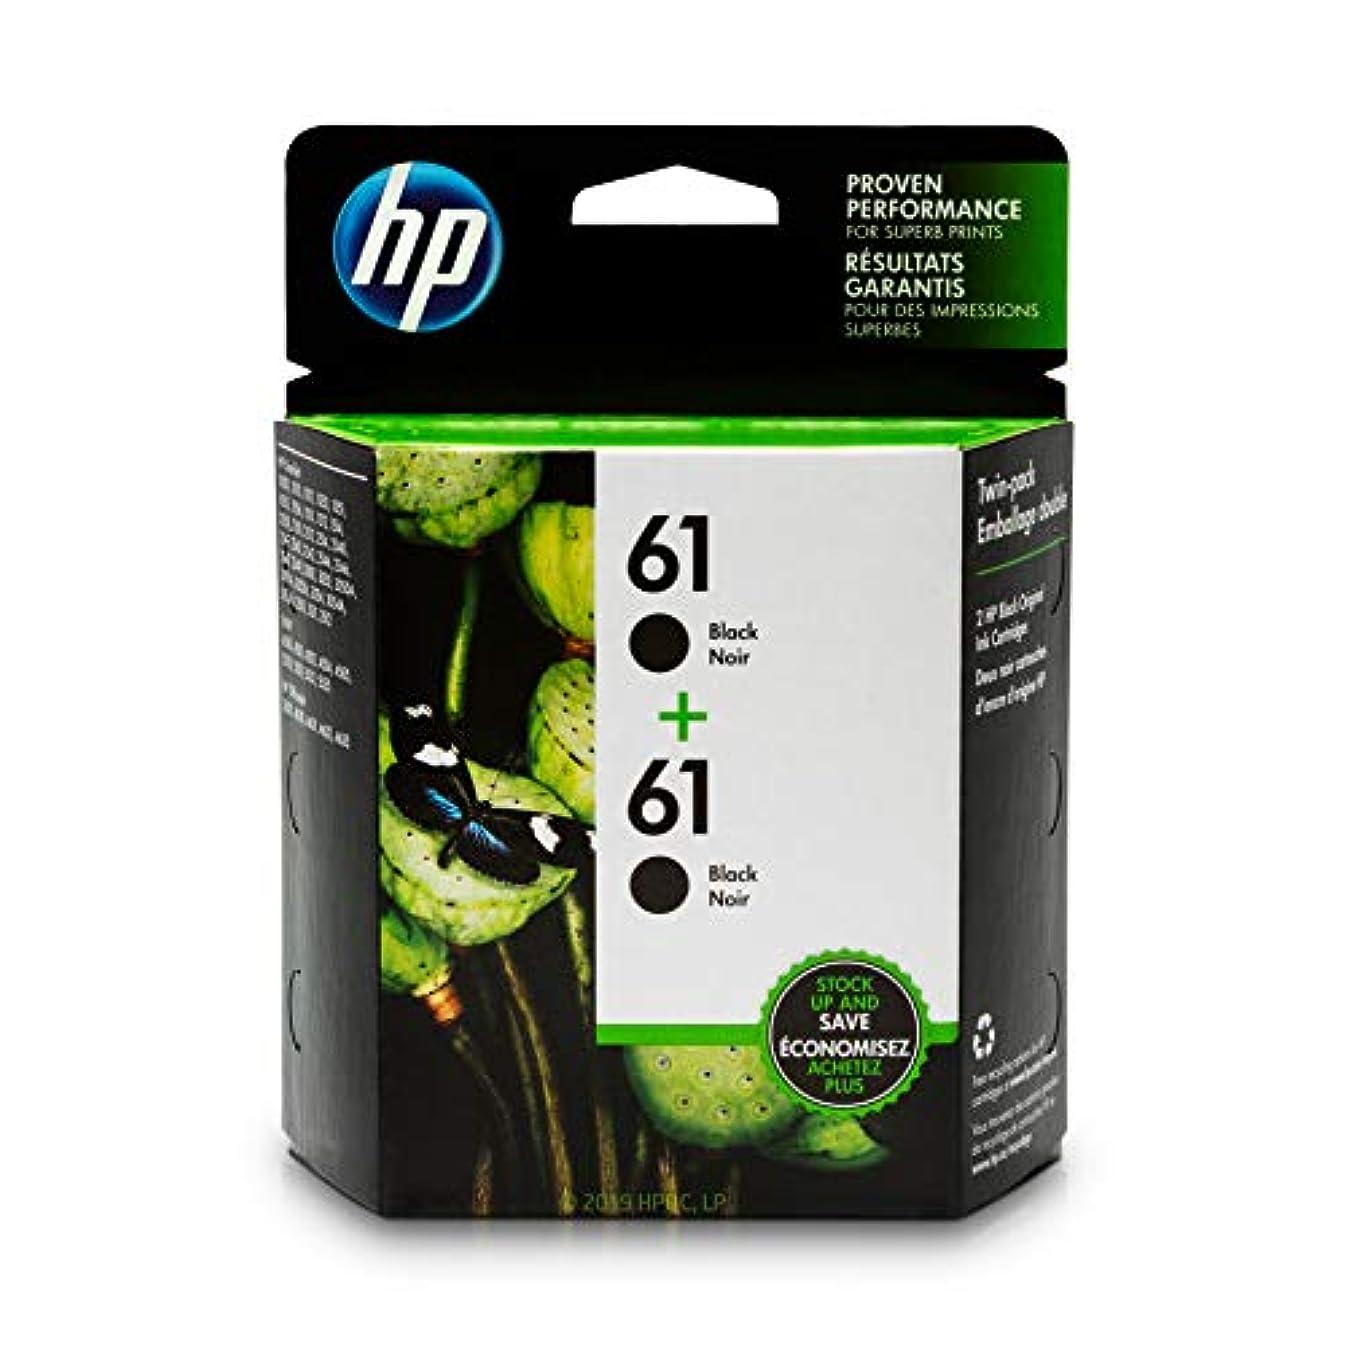 HP 61 Black Ink Cartridge (CH561WN), 2 Ink Cartridges (CZ073FN) for HP Deskjet 1000 1010 1012 1050 1051 1055 1056 1510 1512 1514 1051 2050 2510 2512 2514 2540 2541